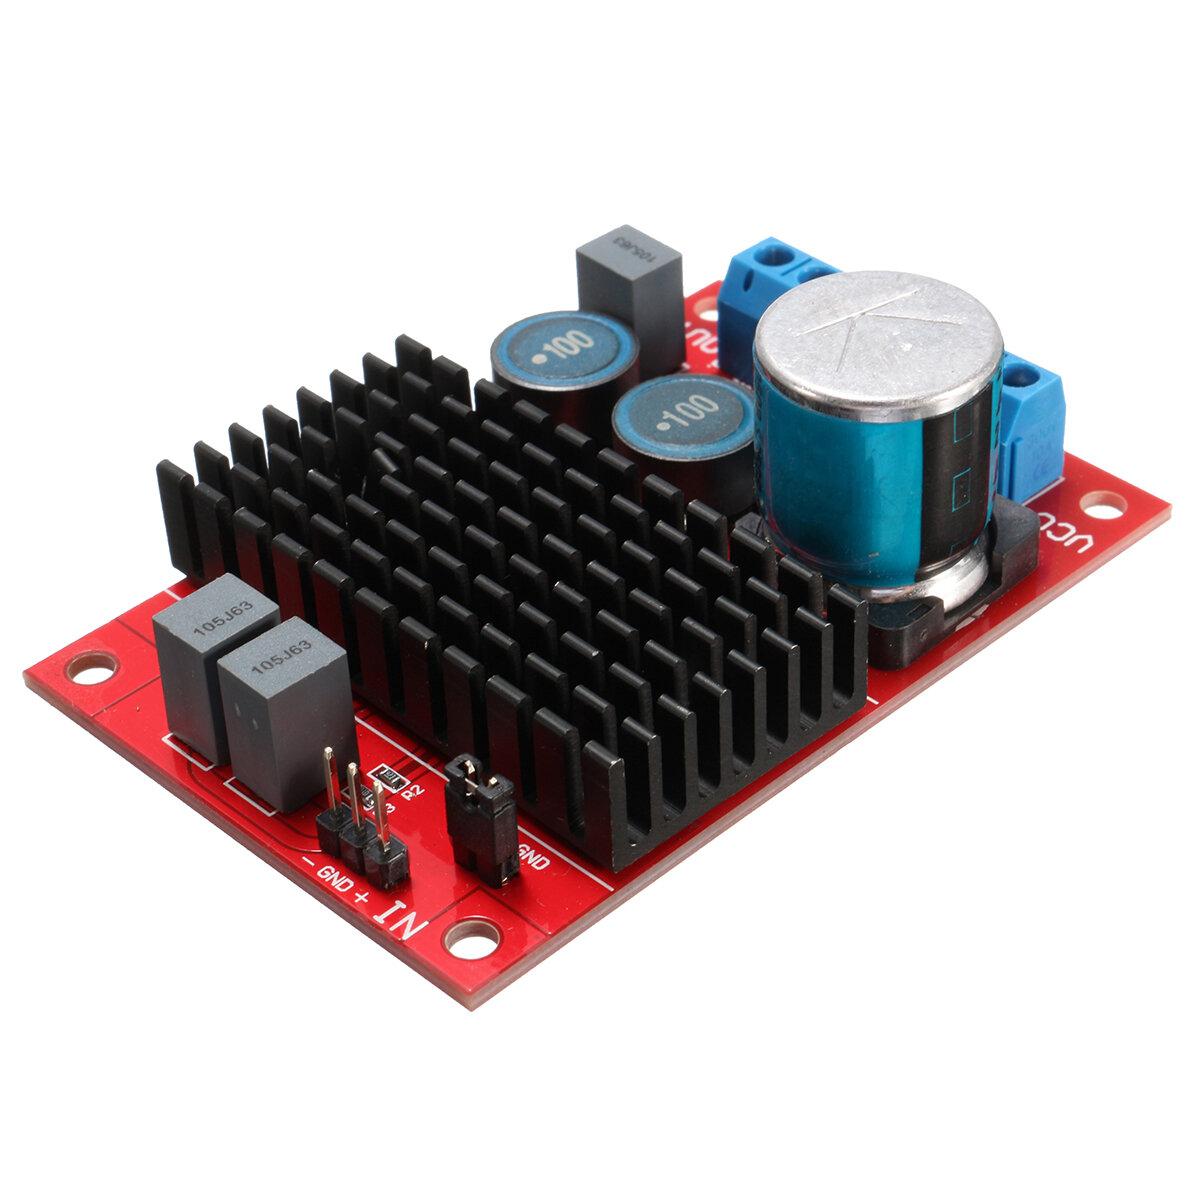 DC 12V-24V 100W BTL Out TPA3116 Mono Channel Digital Power Audio Amplifier  Board